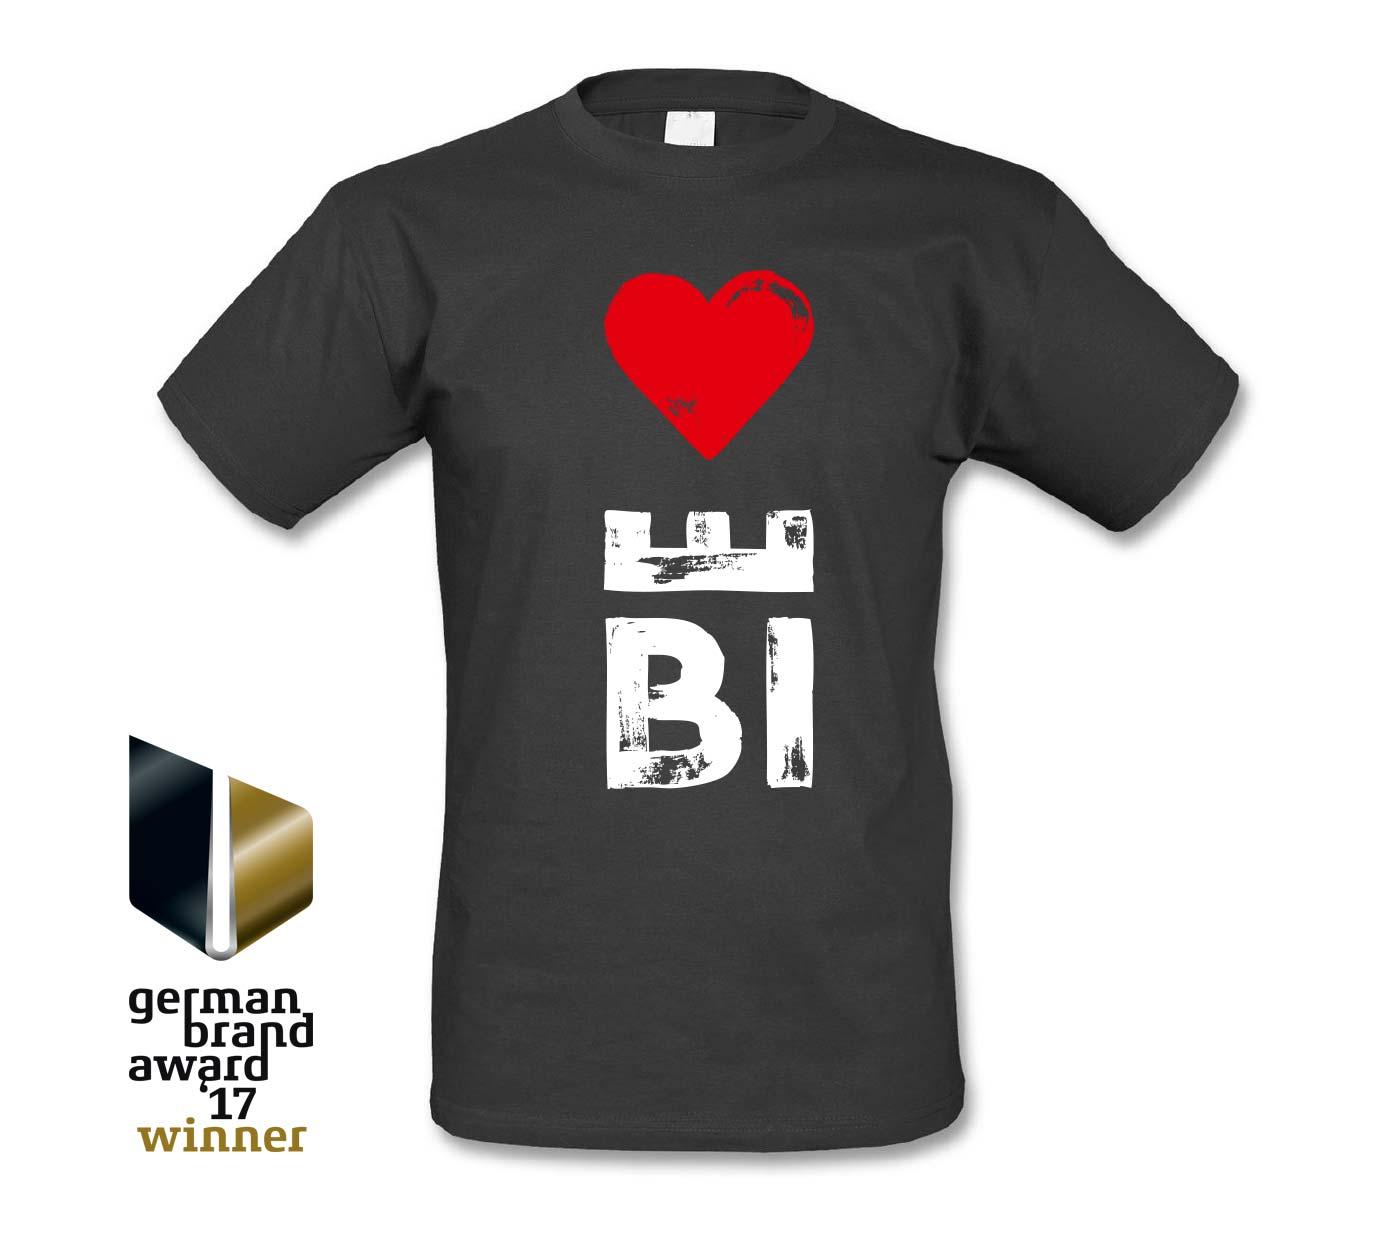 Stadt Bielefeld Corporate Design T-Shirt